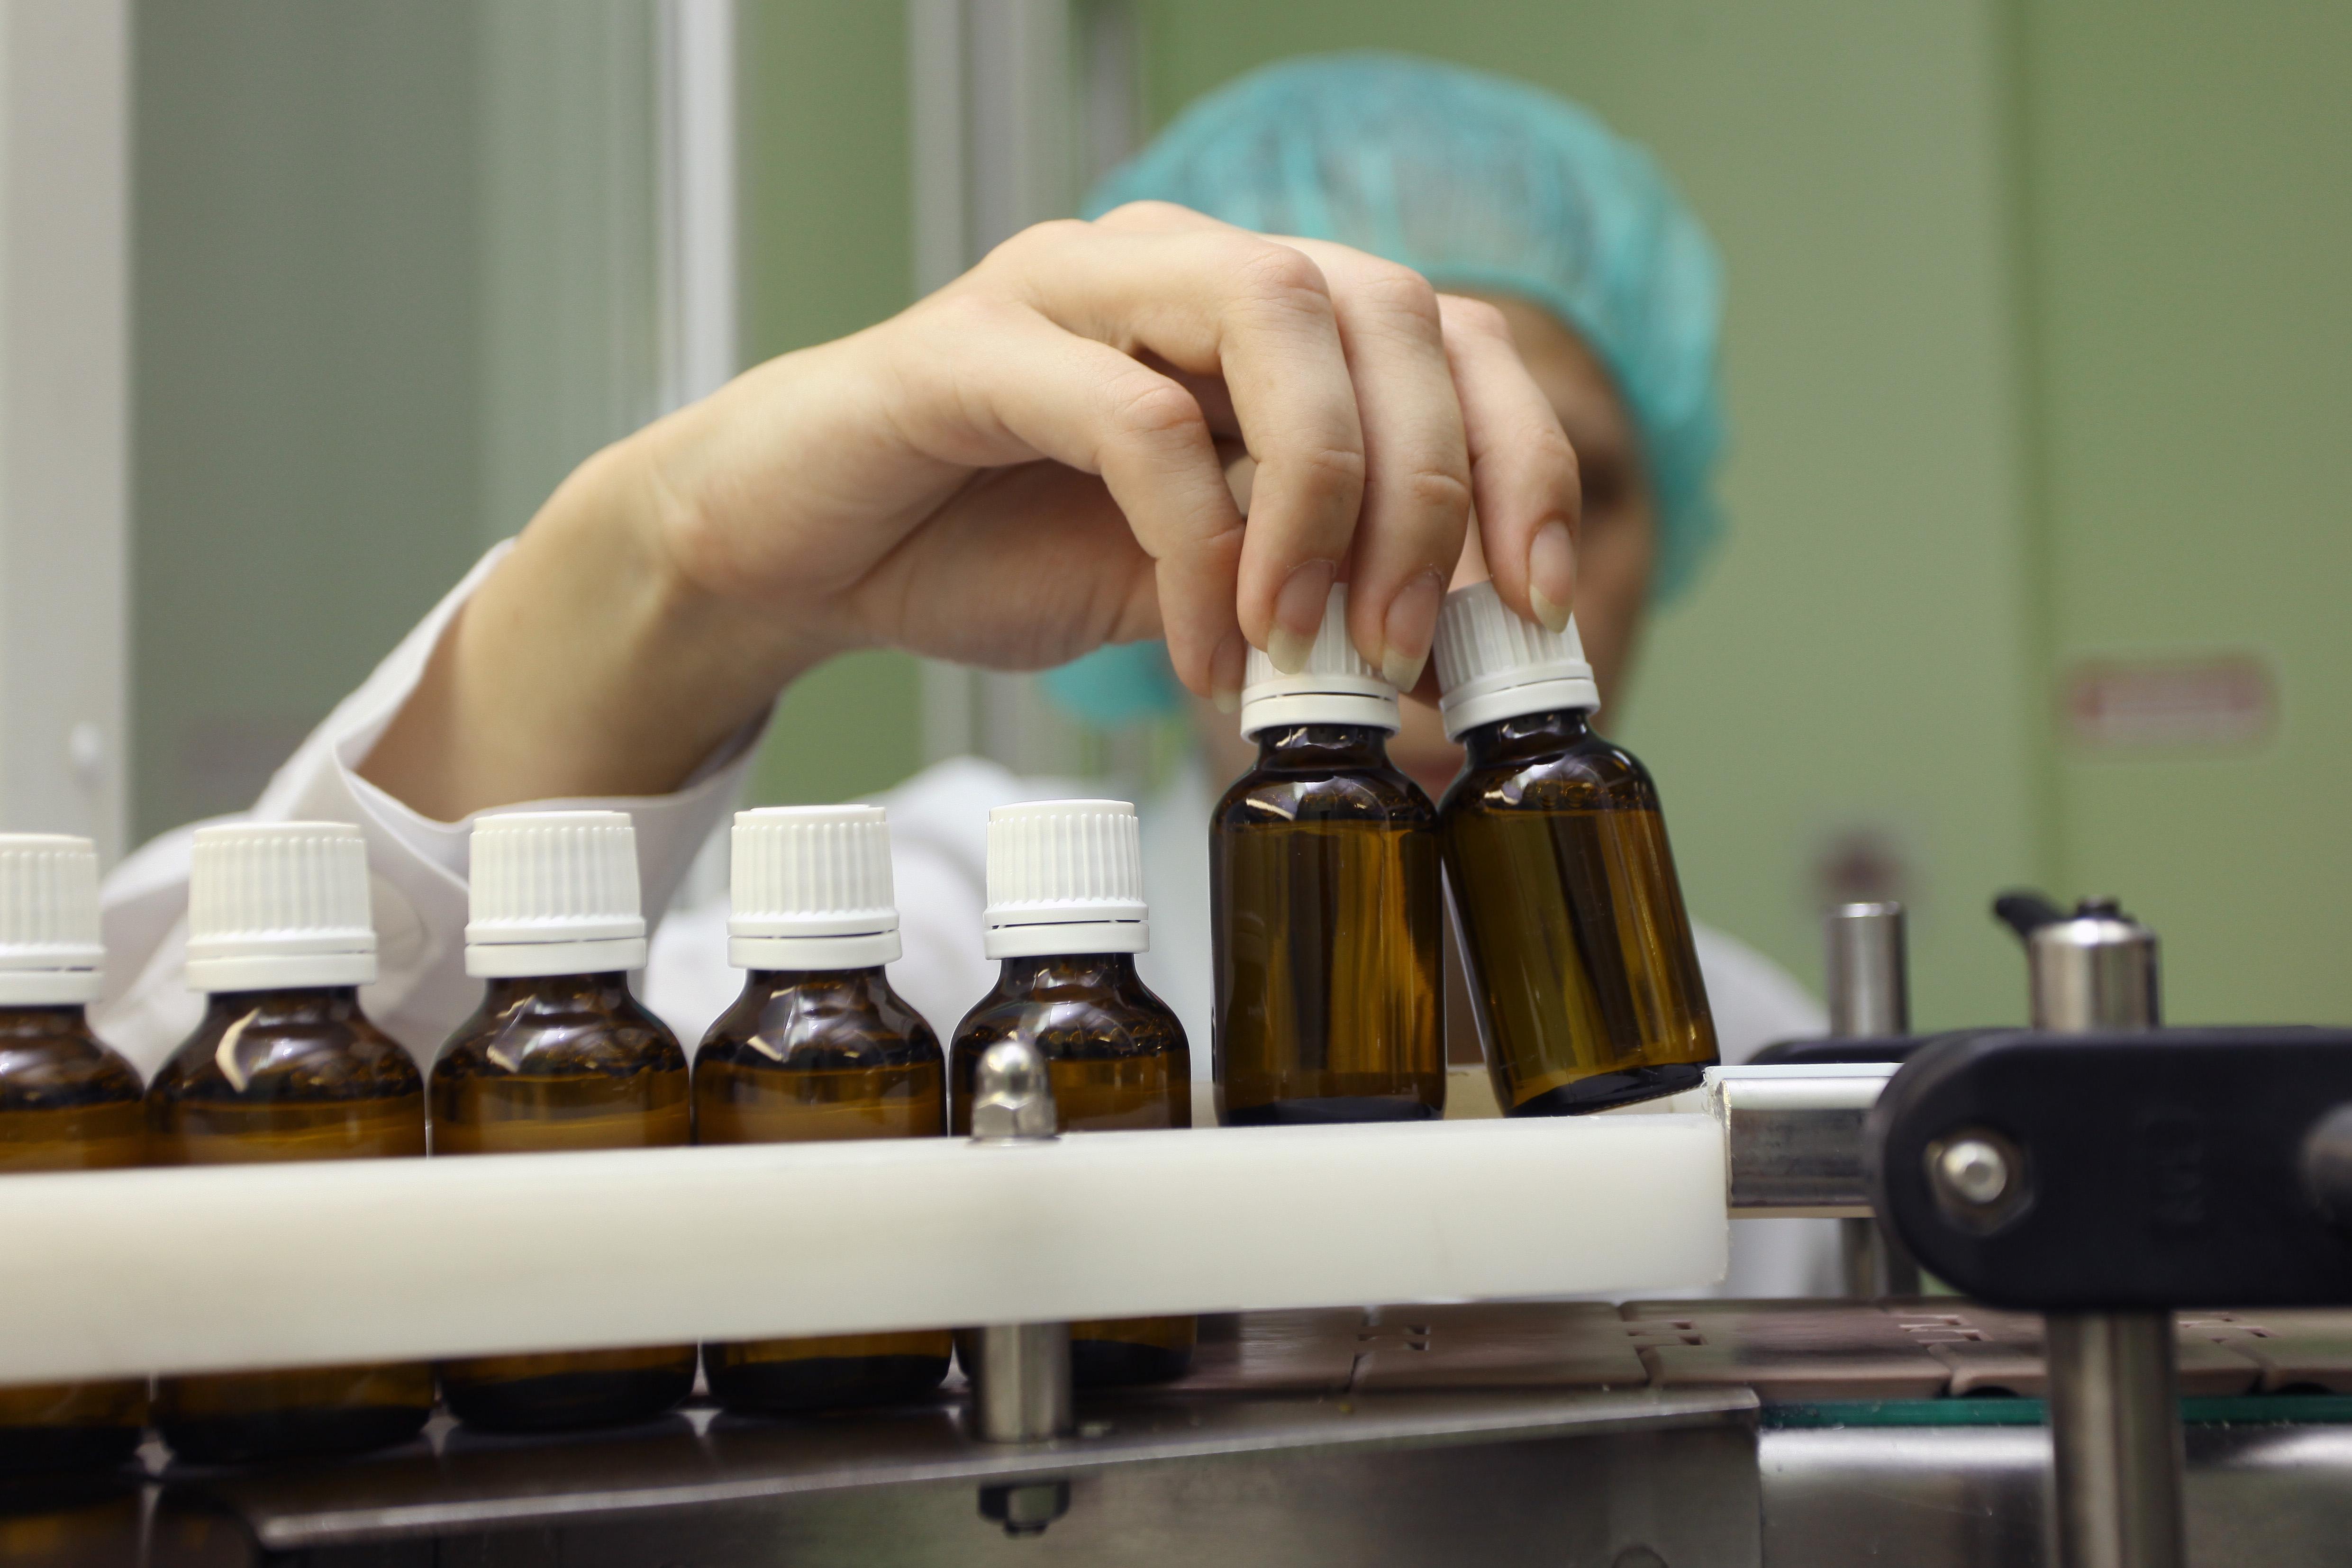 Минздрав: Увеличение расходов на лекарства от рака не влияет на доступность других препаратов